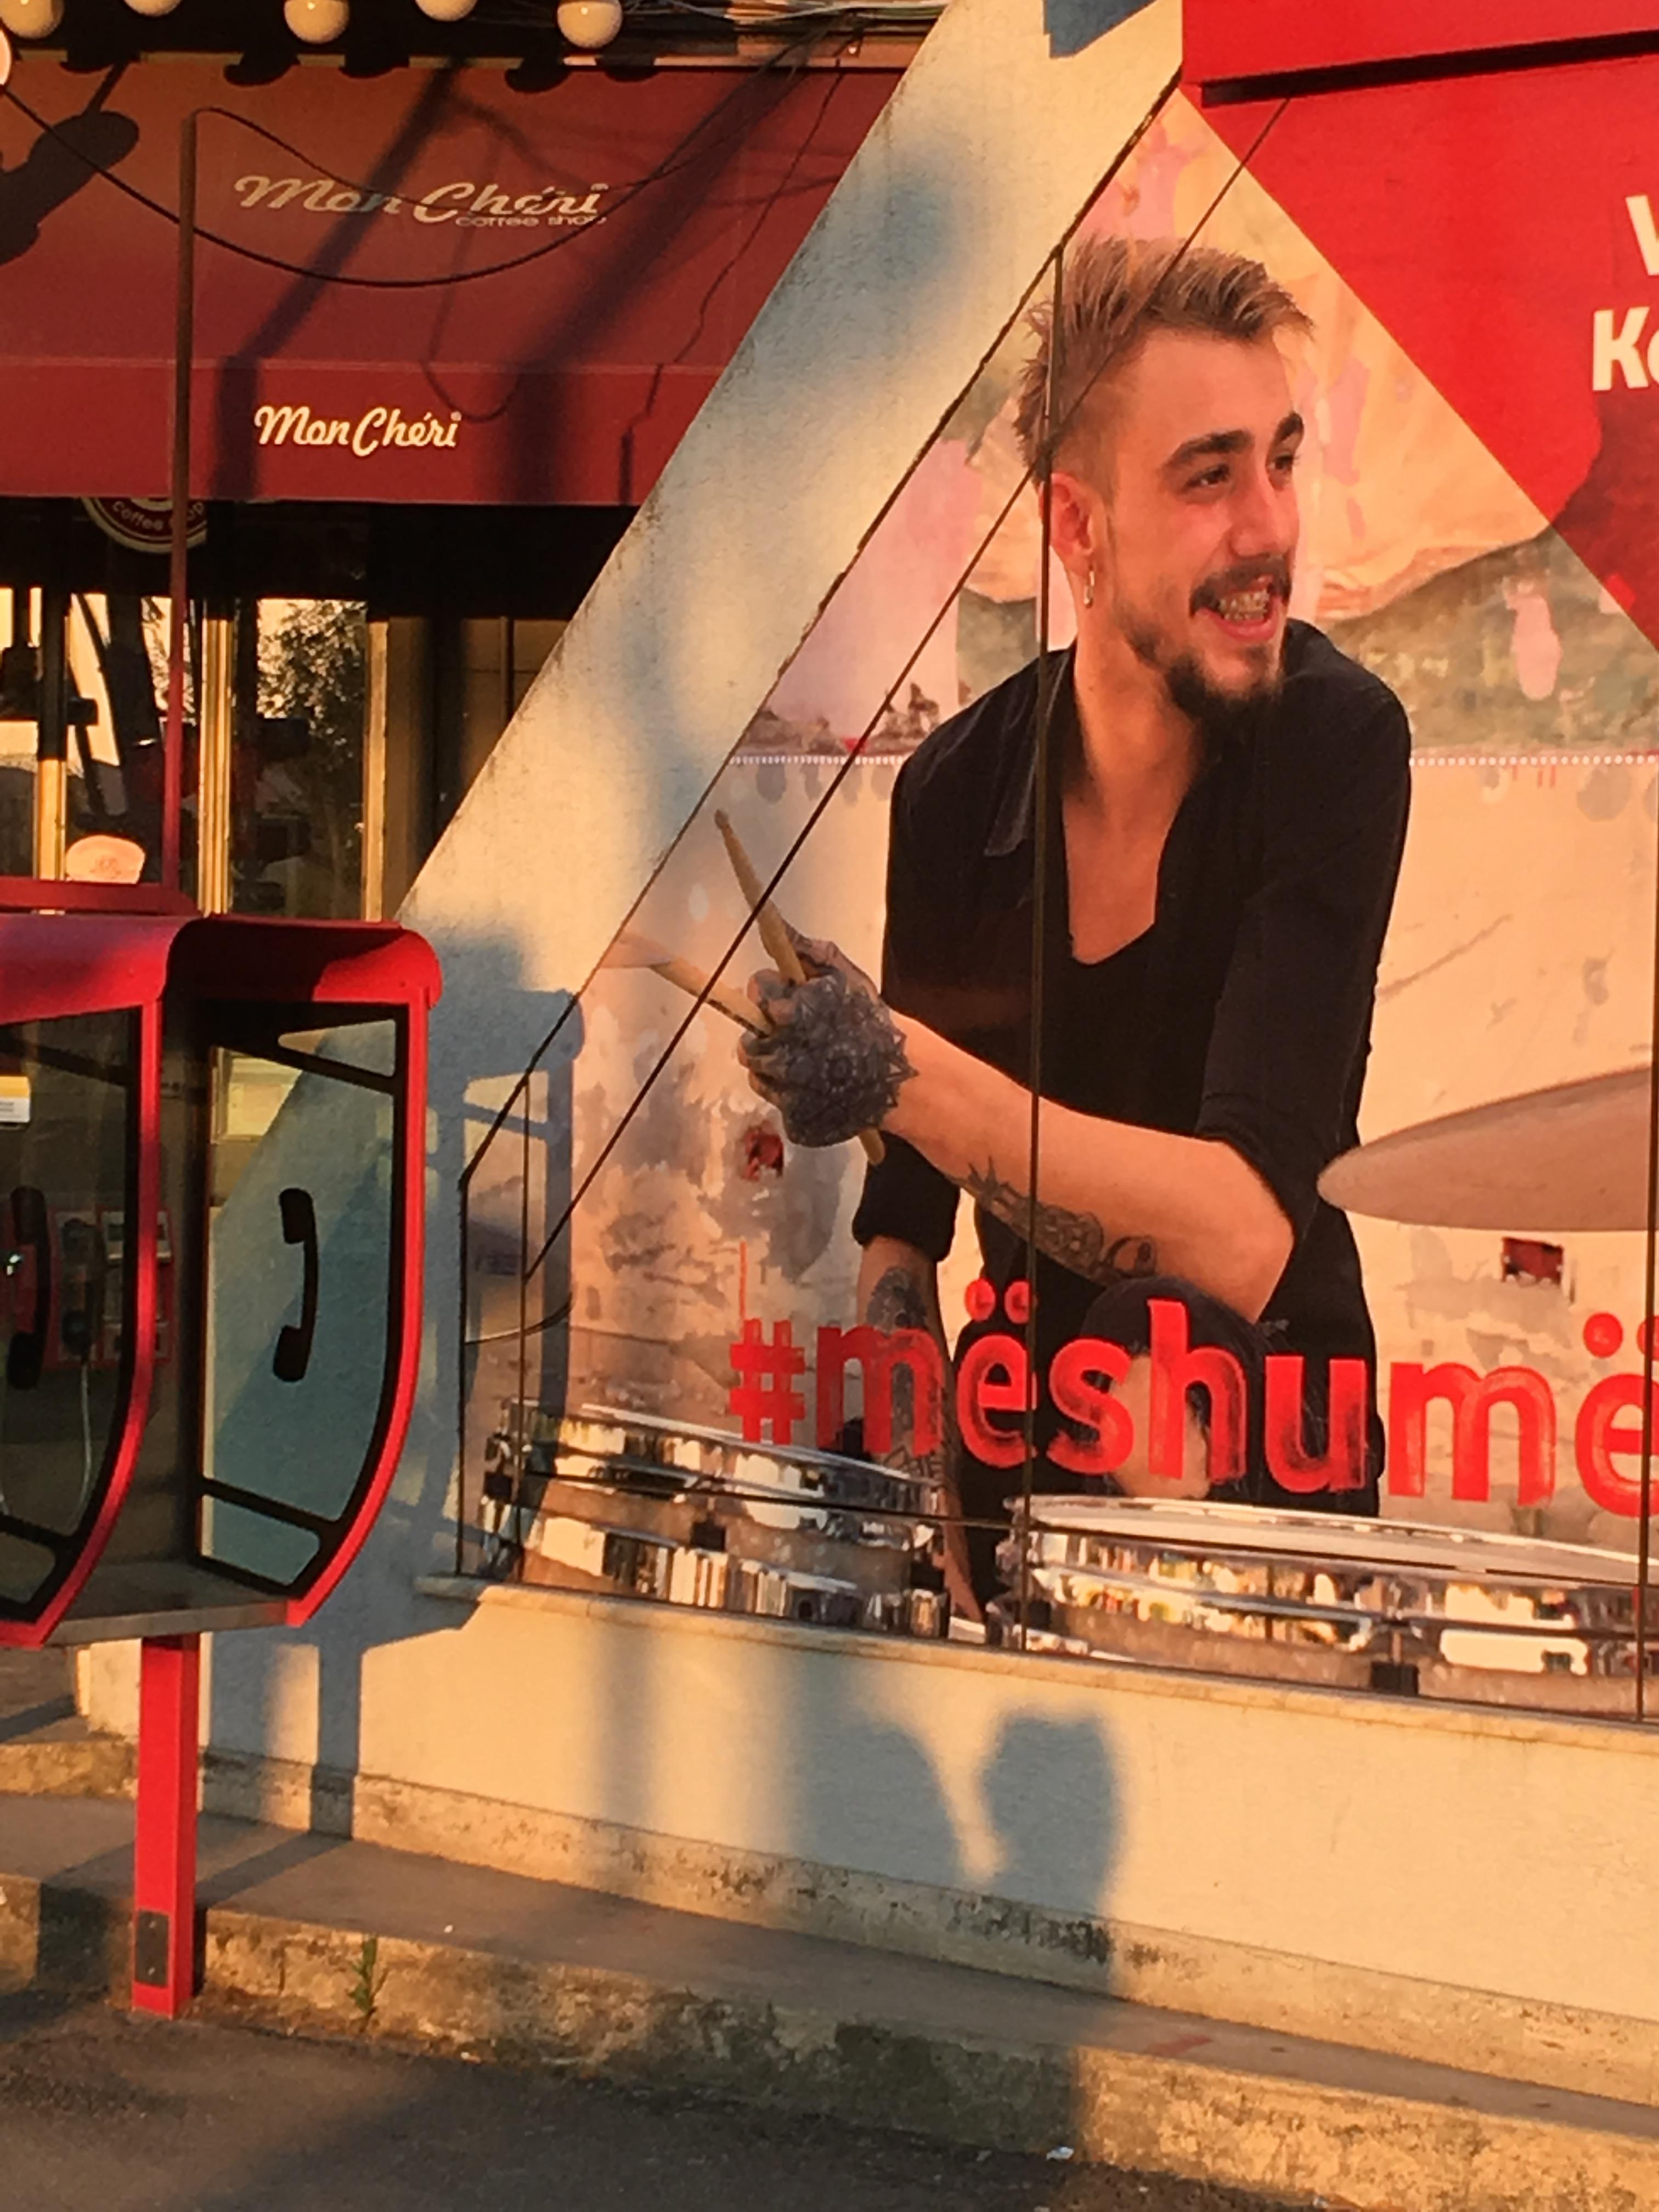 Albanian cellphone ad